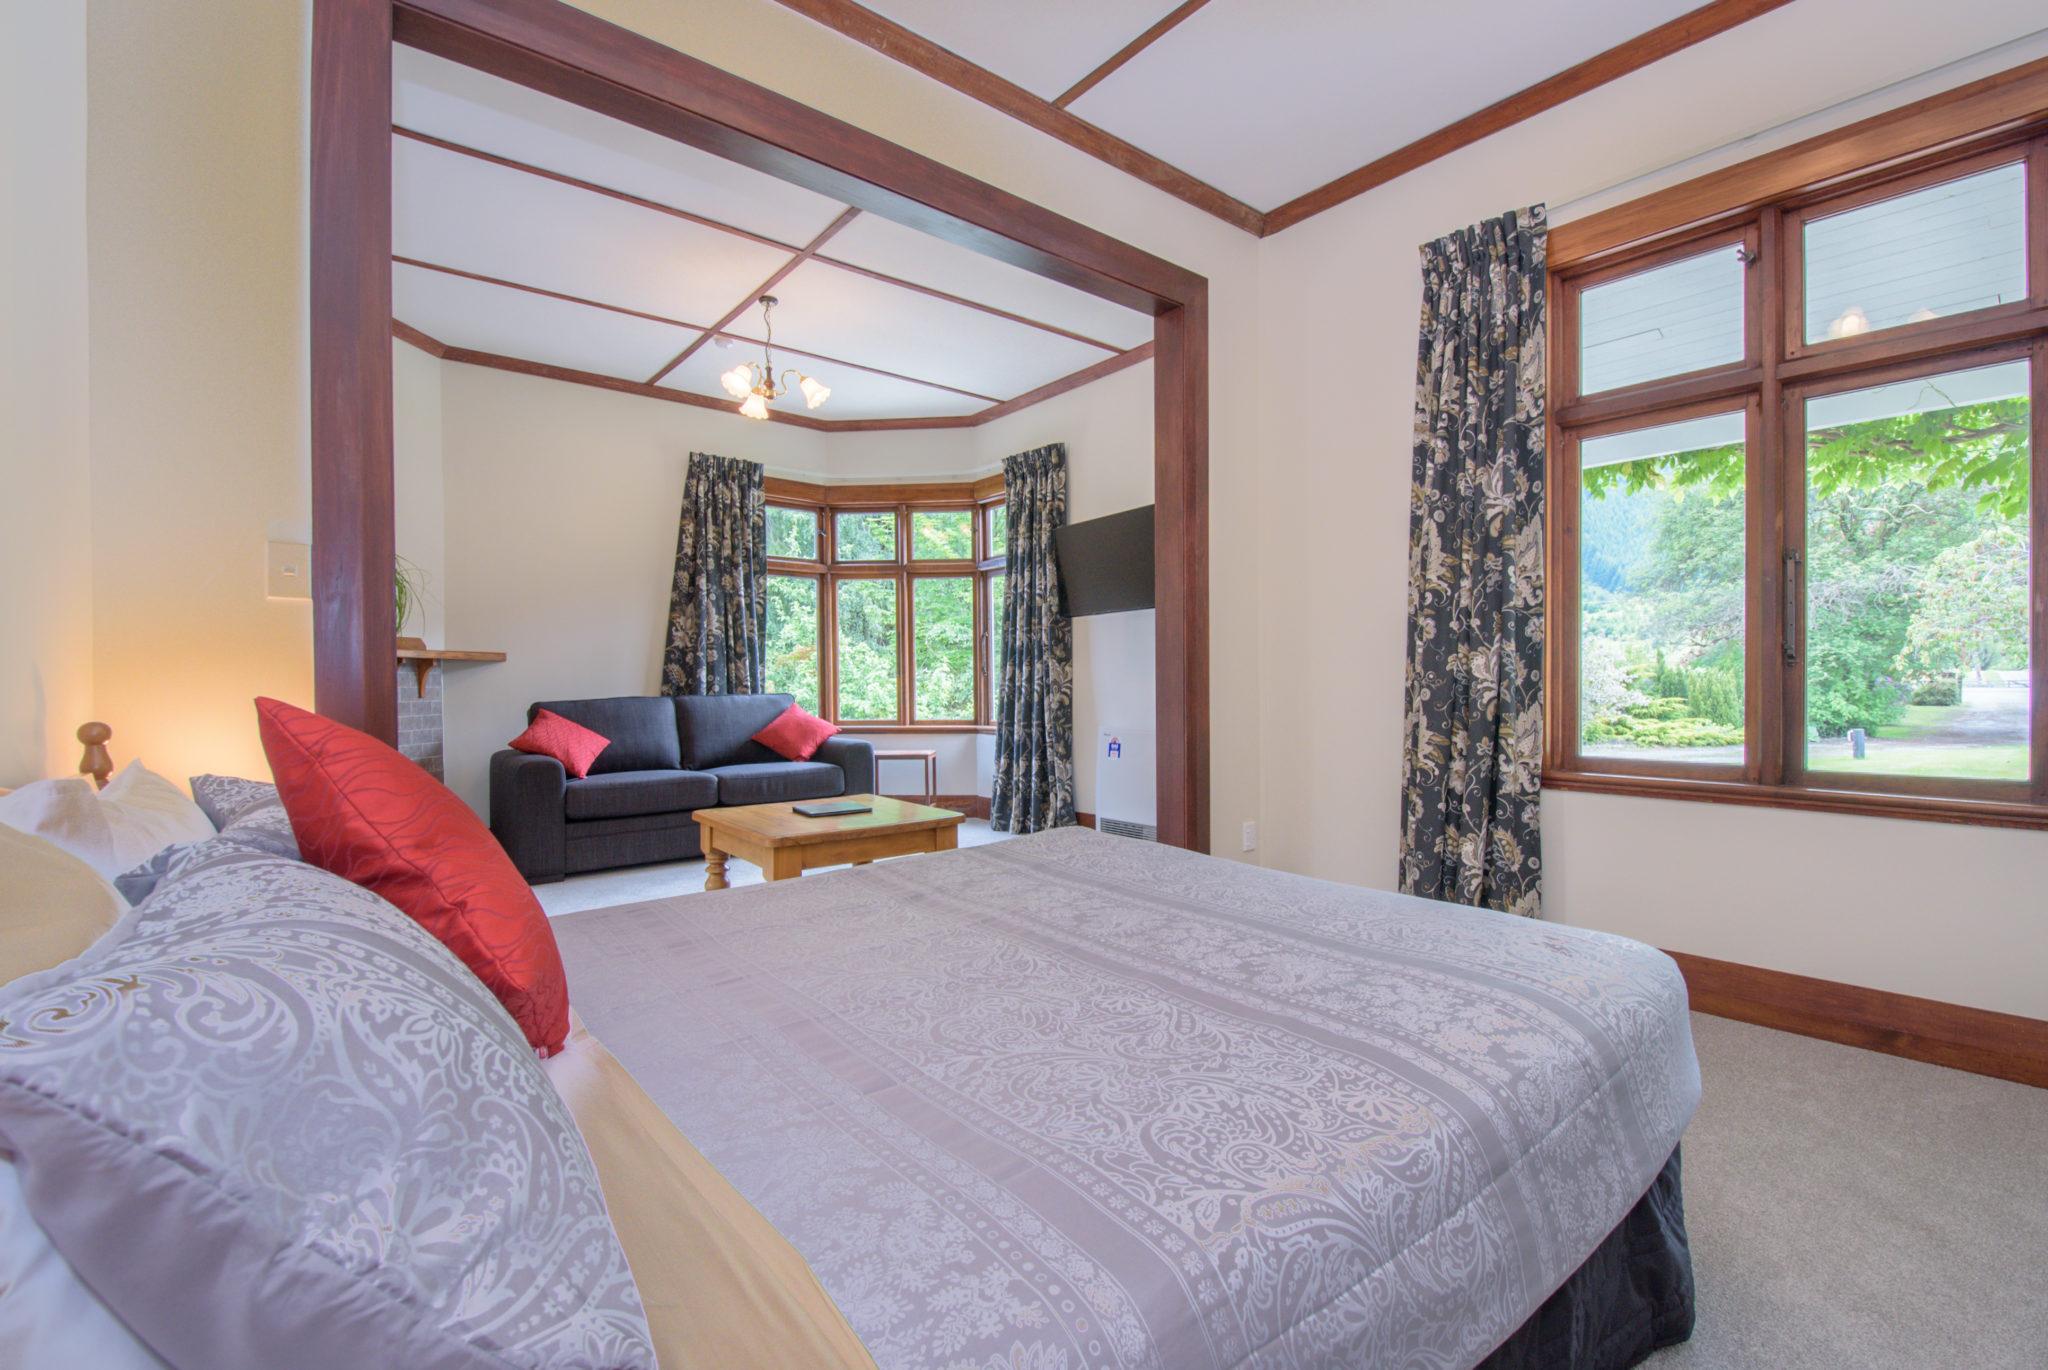 Queen Studio Apartment at Coronet Peak, New Zealand